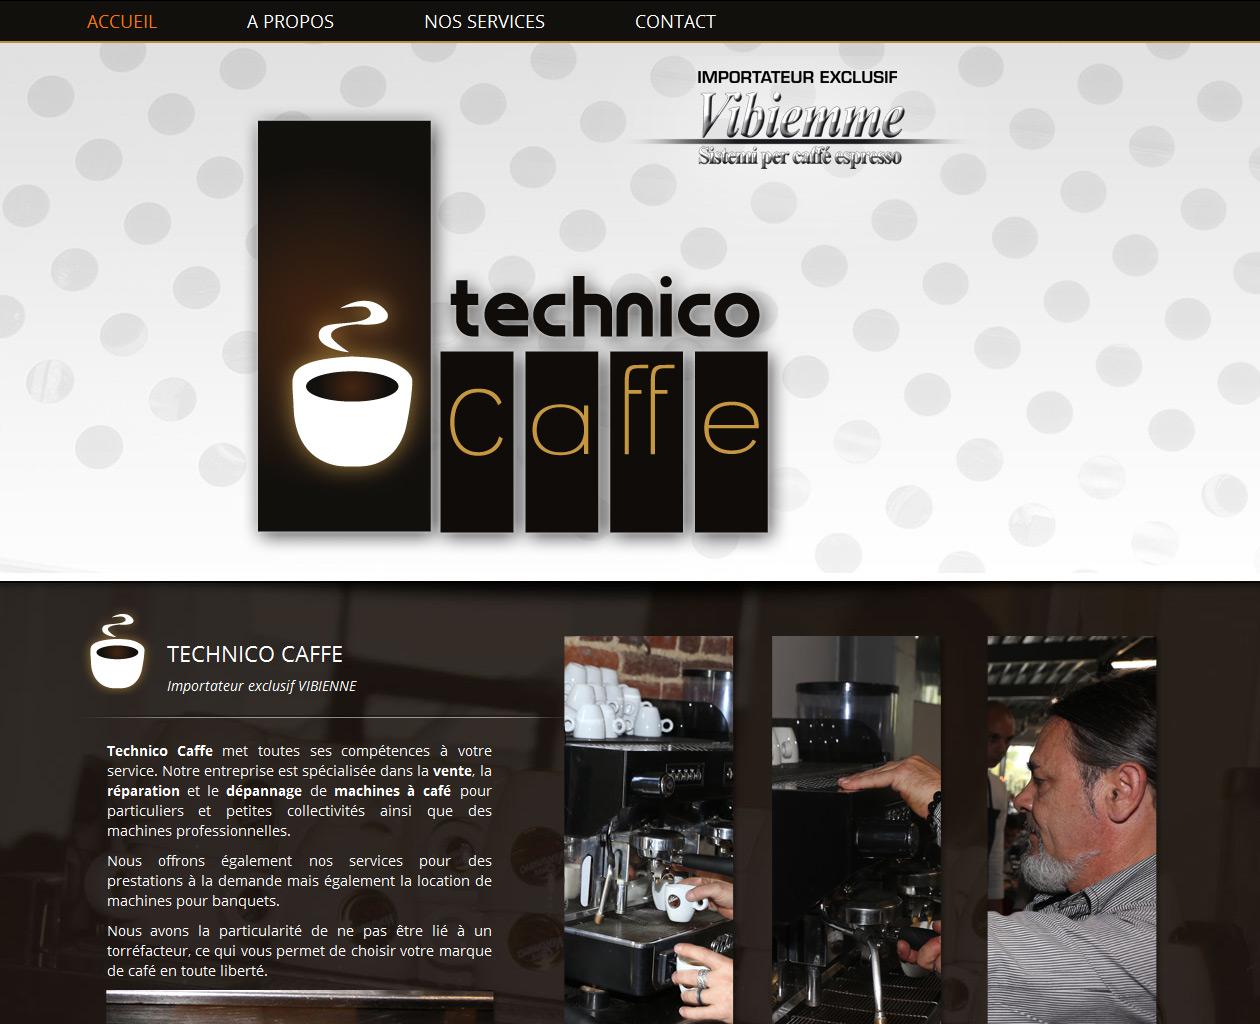 Technico Caffe